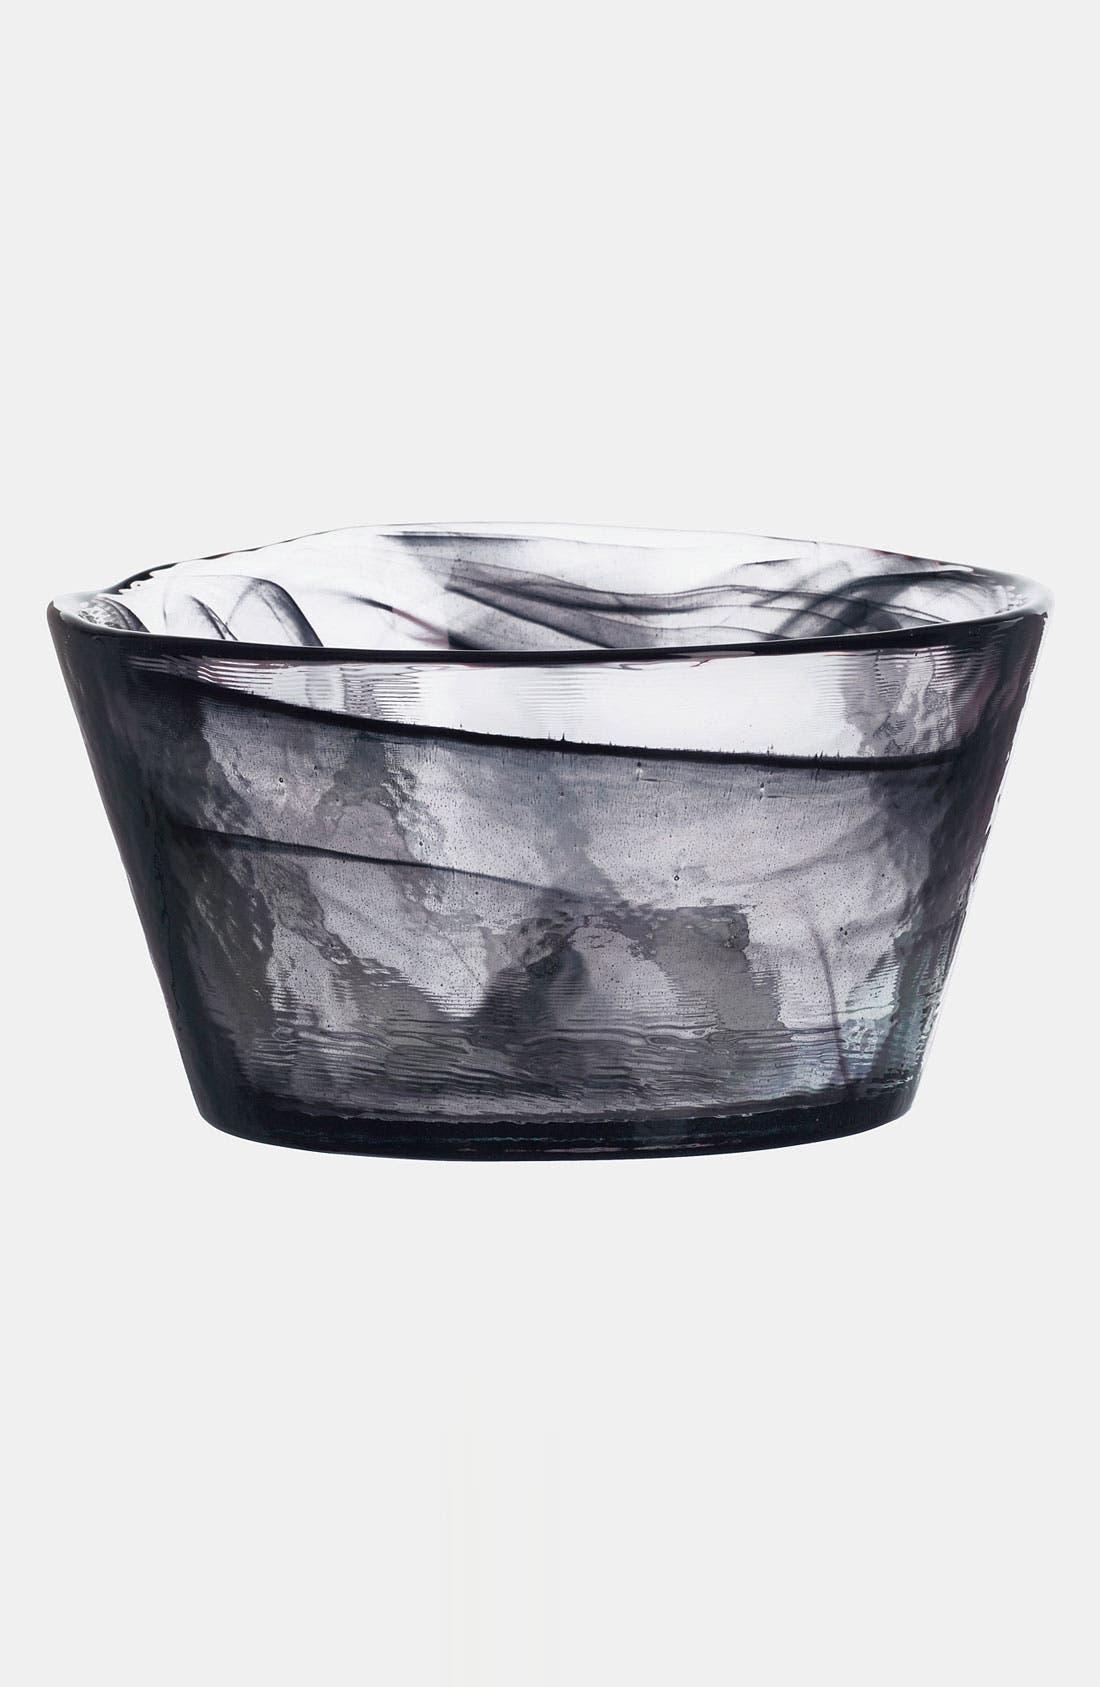 Image of Kosta Boda Mine Small Bowl